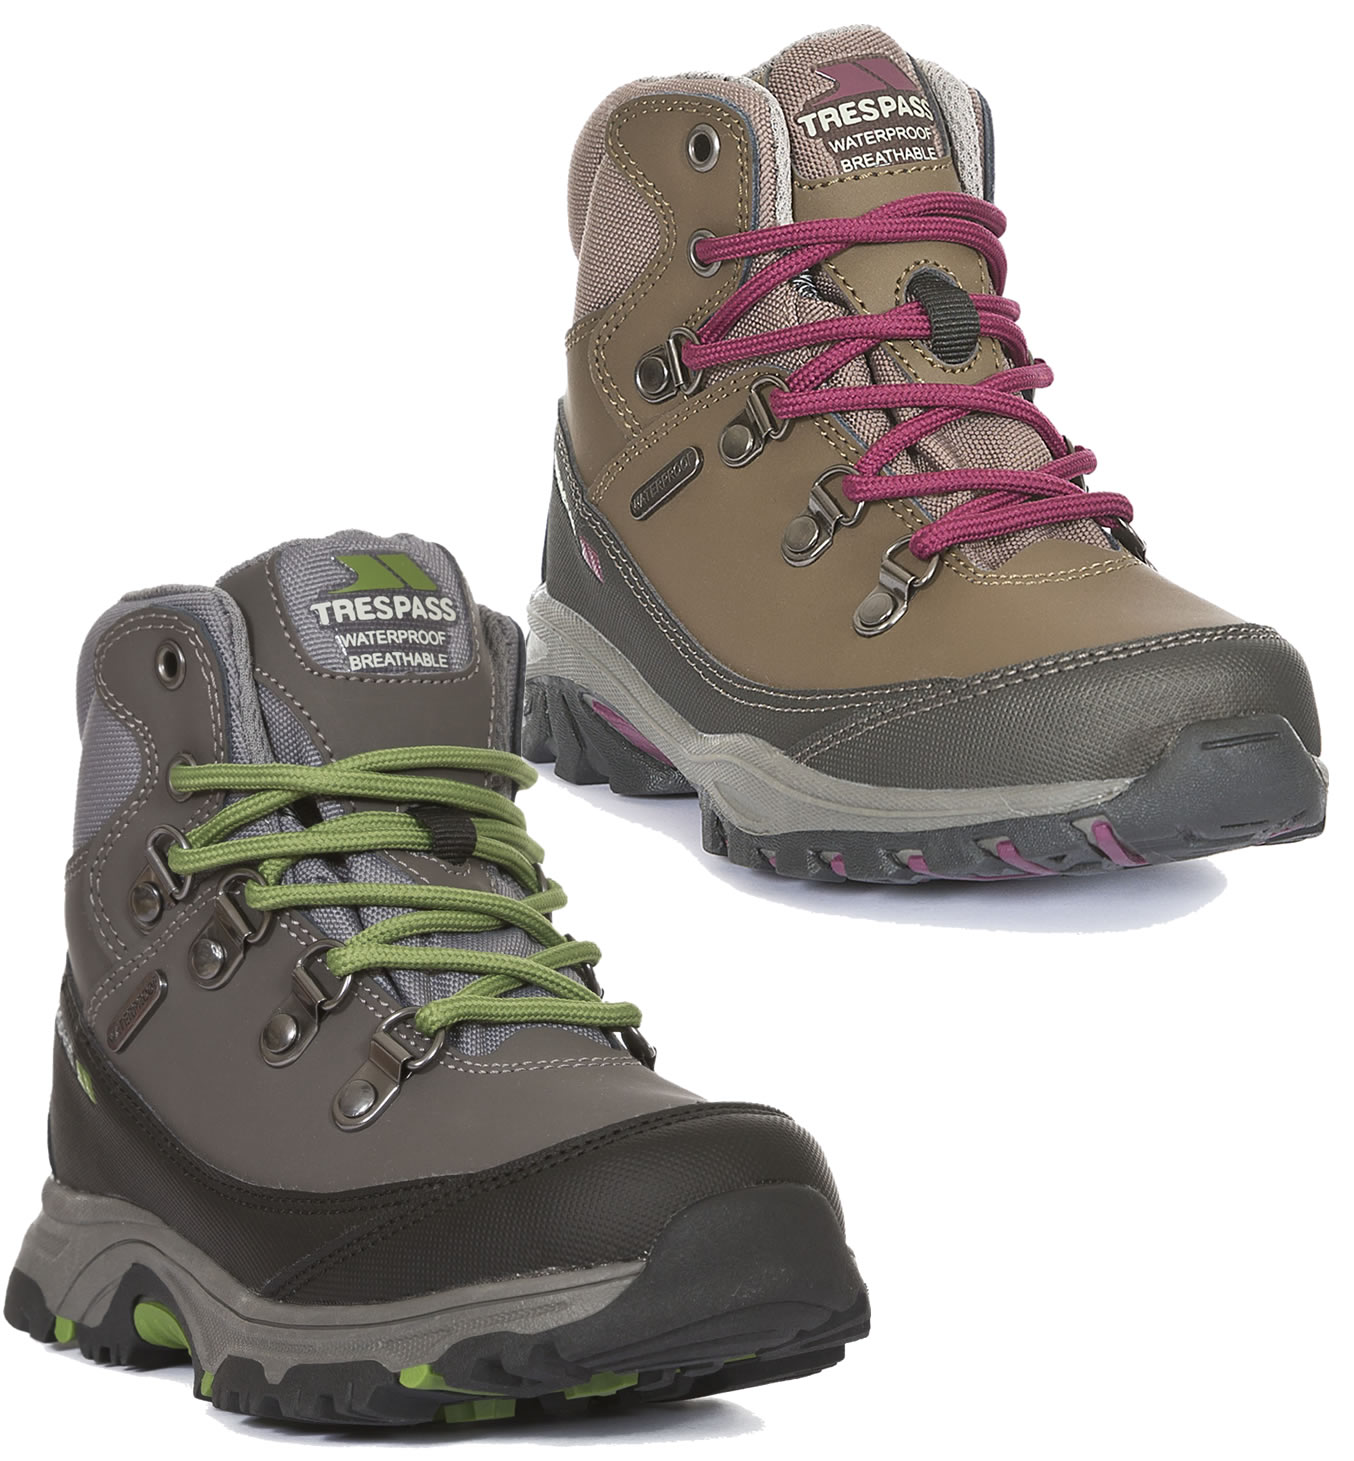 Trespass Glebe II Kids Walking Boots